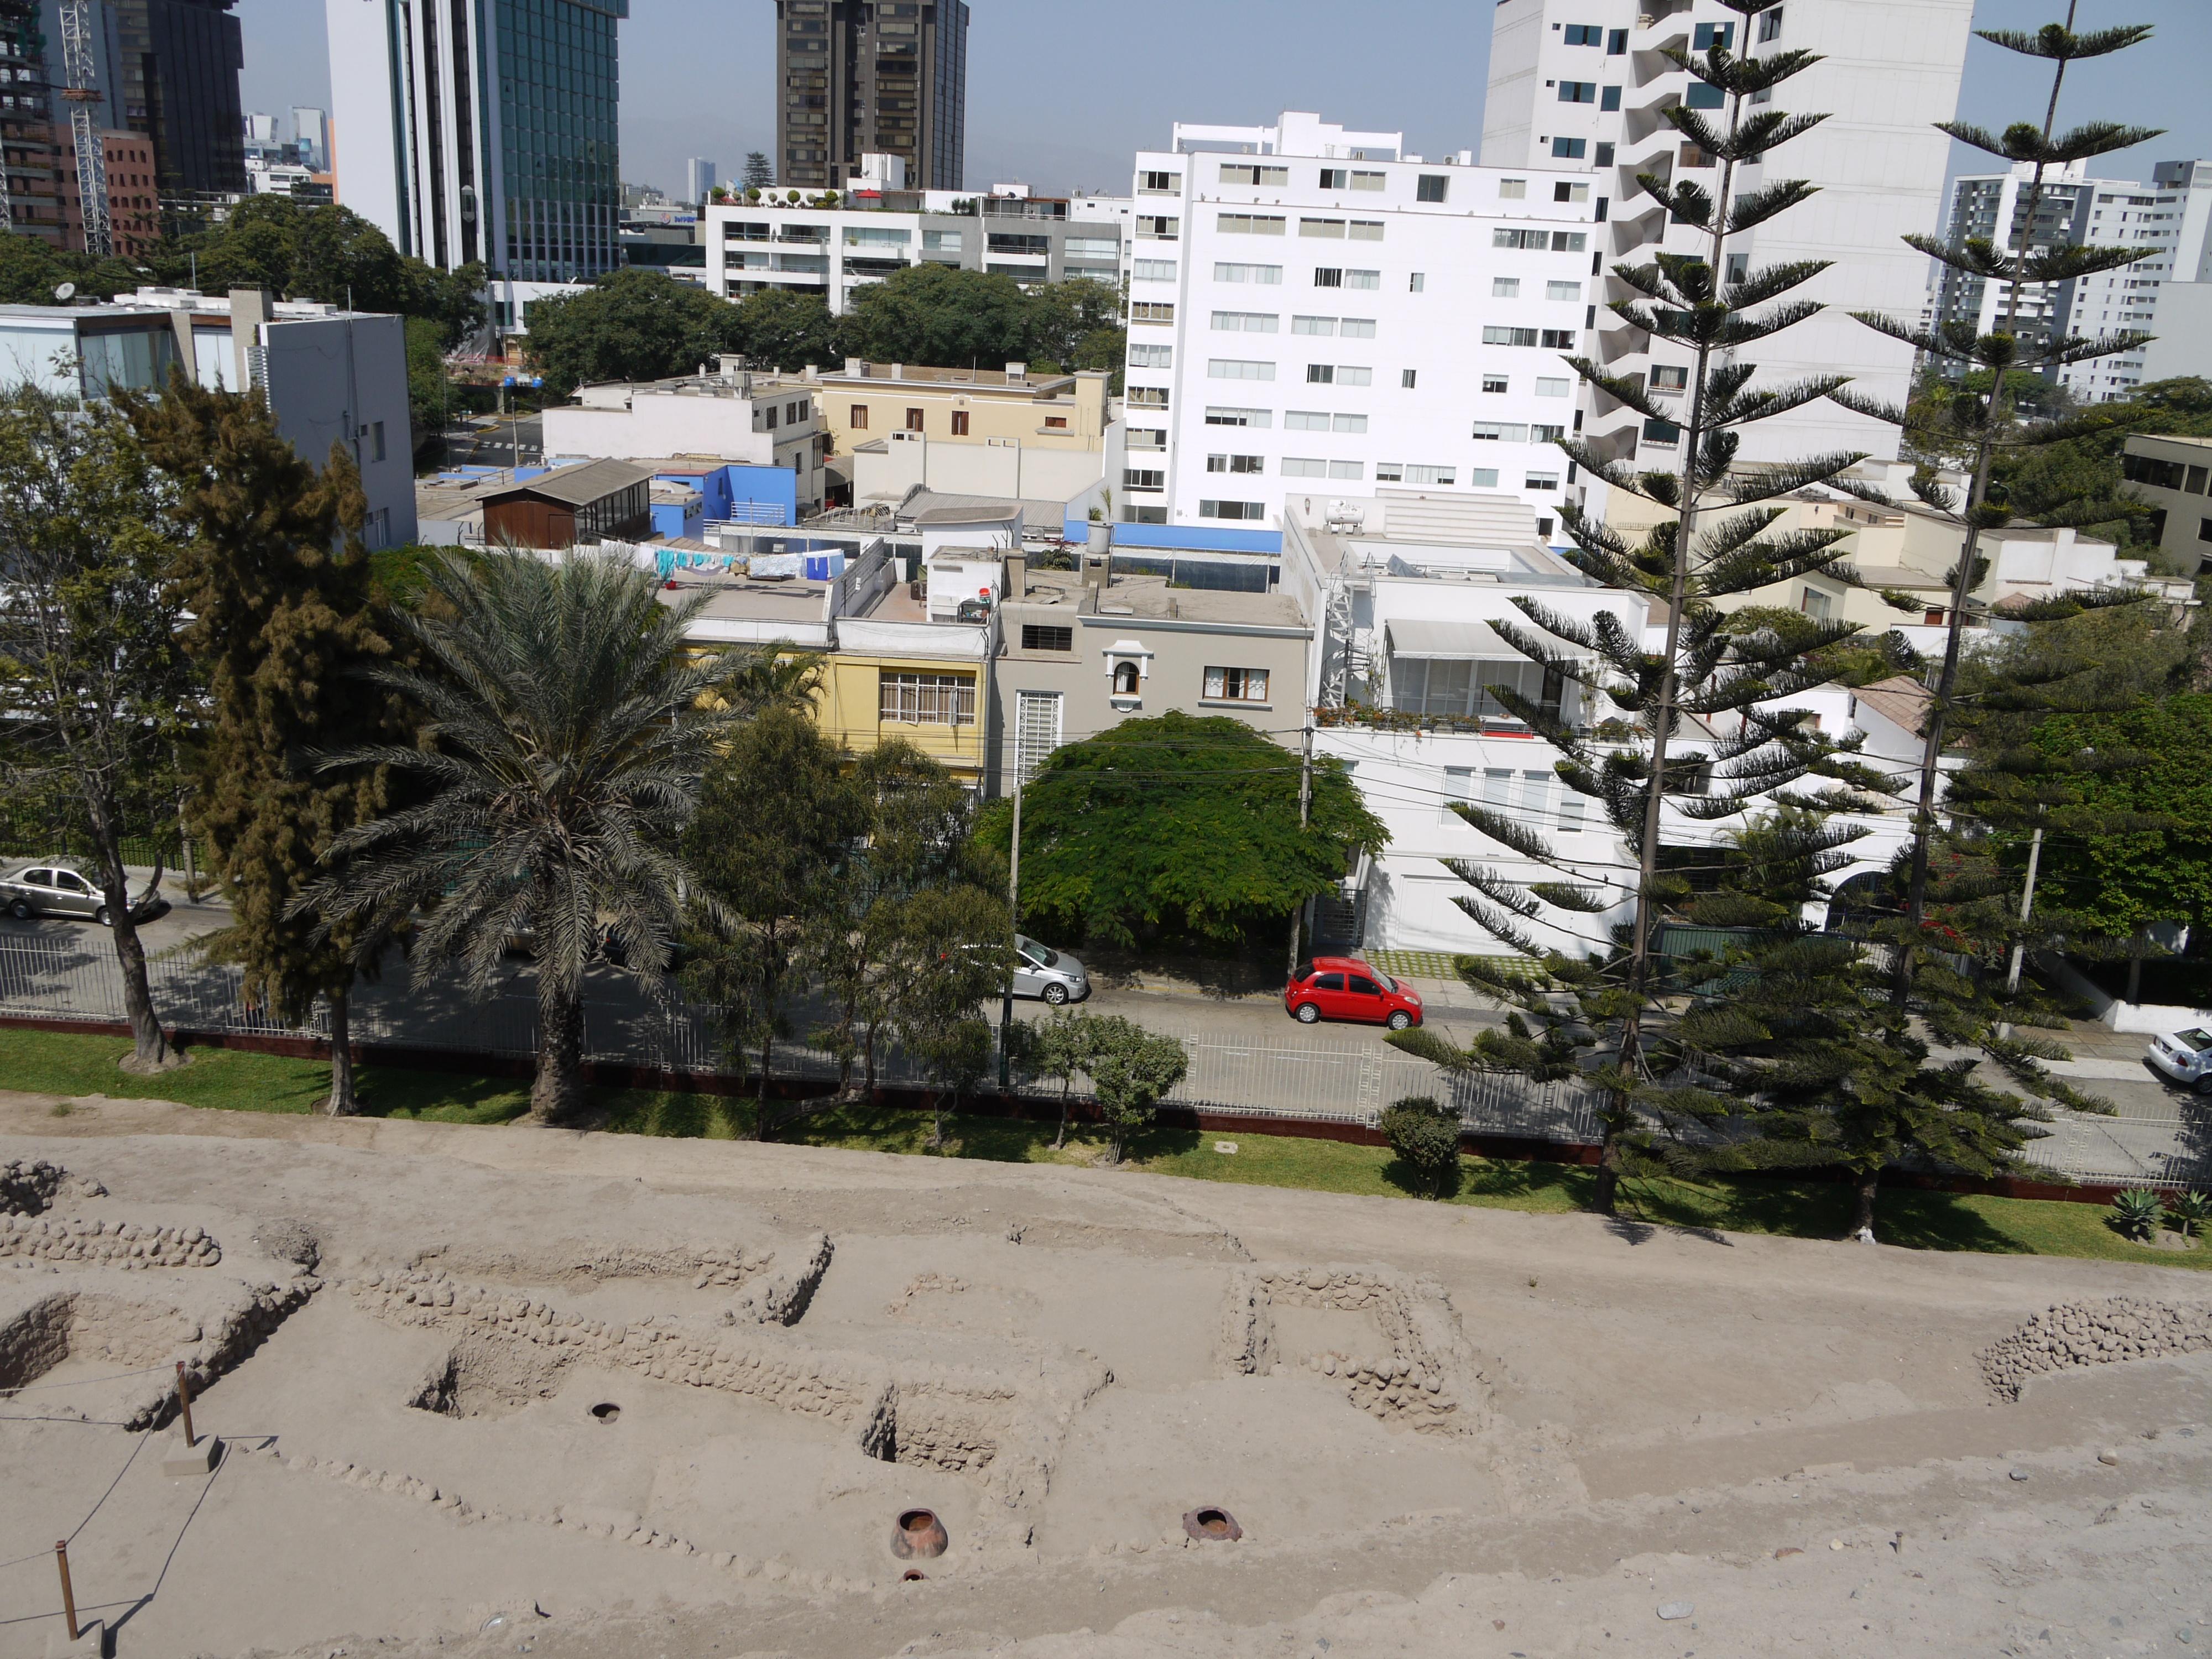 File:Lima, Peru (San Isidro) Huaca Huallamarca 01 jpg